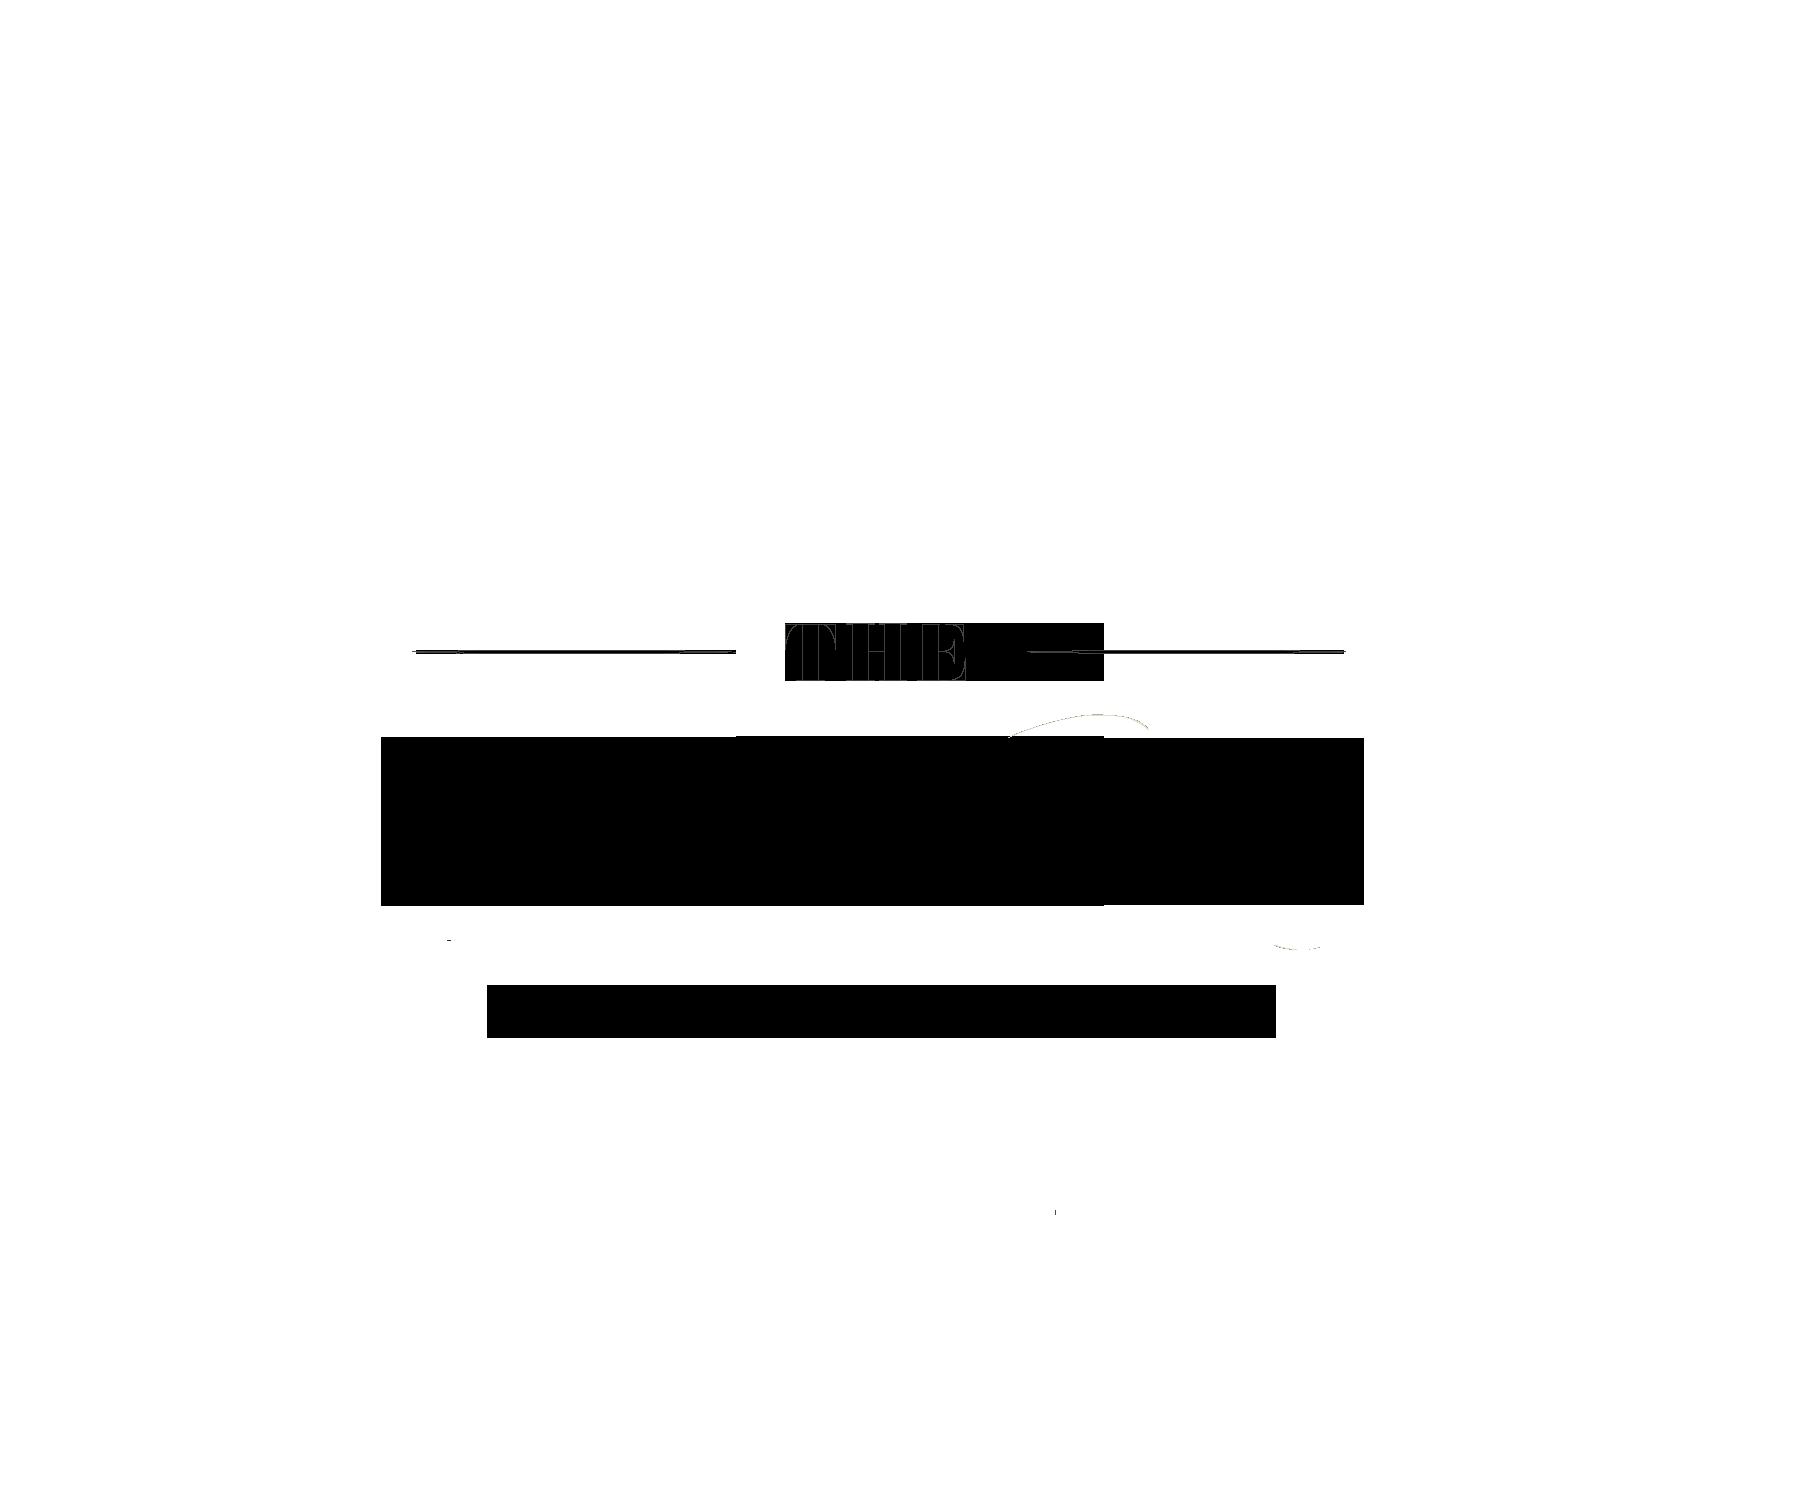 Crave_grille_logo_1